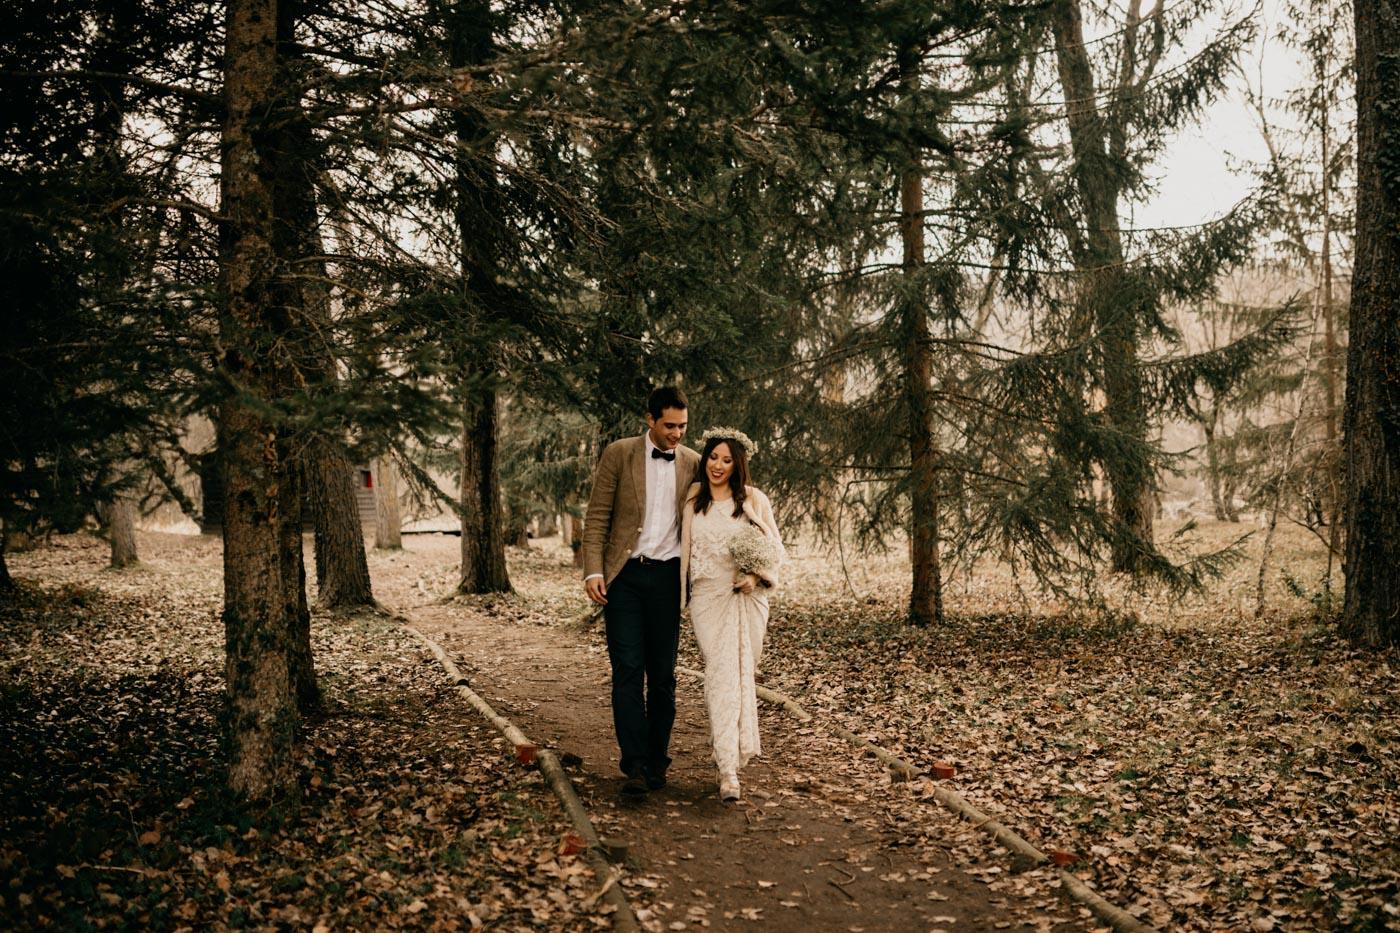 Velvet-Hush-fotografos-boda-al-aire-libre-madrid-098